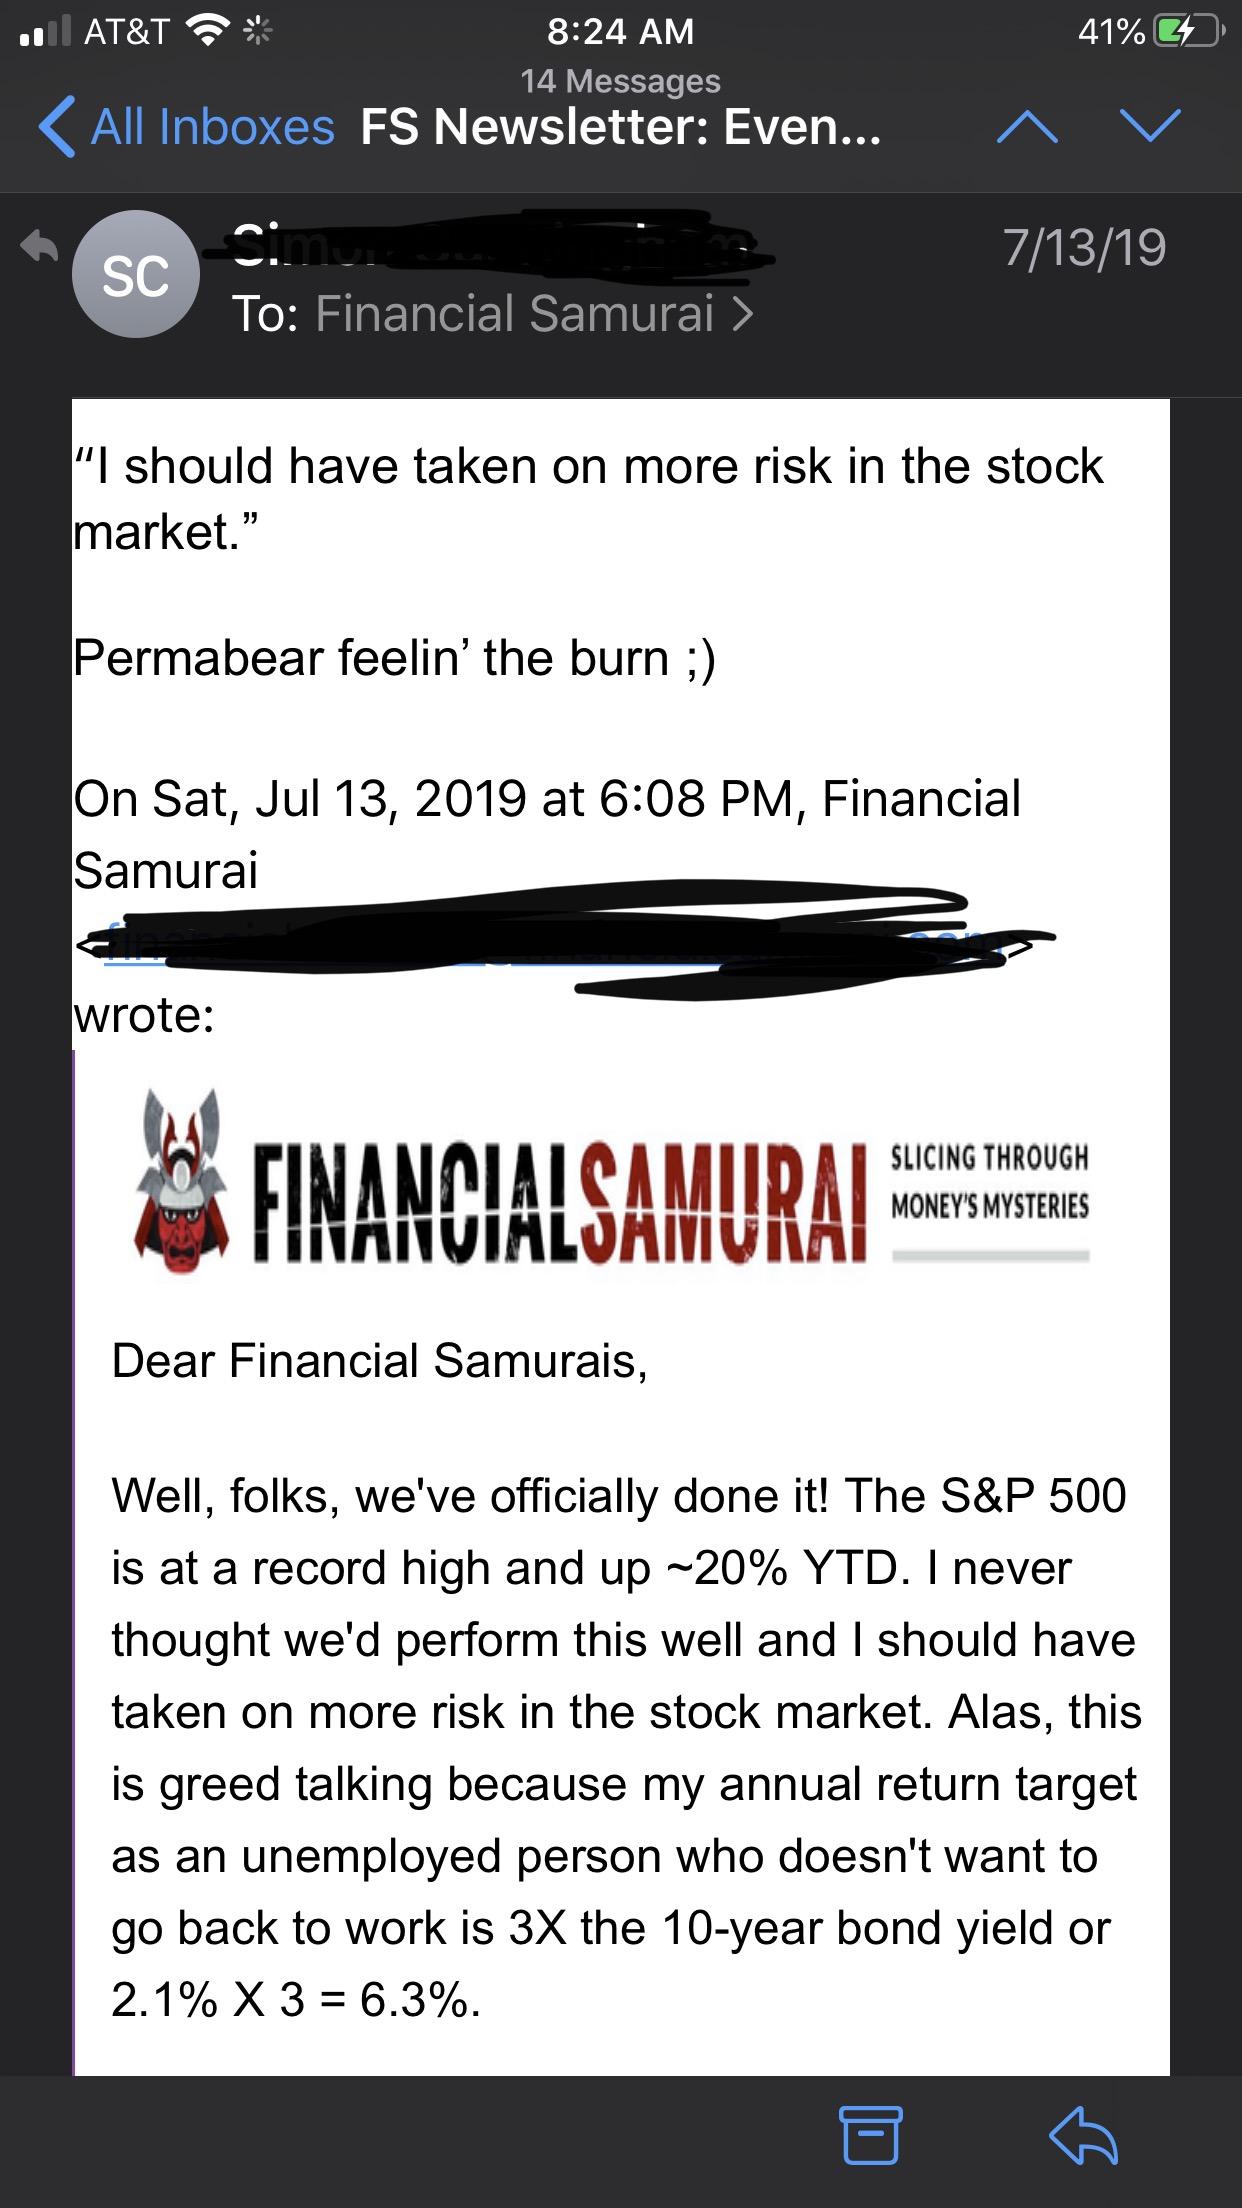 Making fun of Financial Samurai